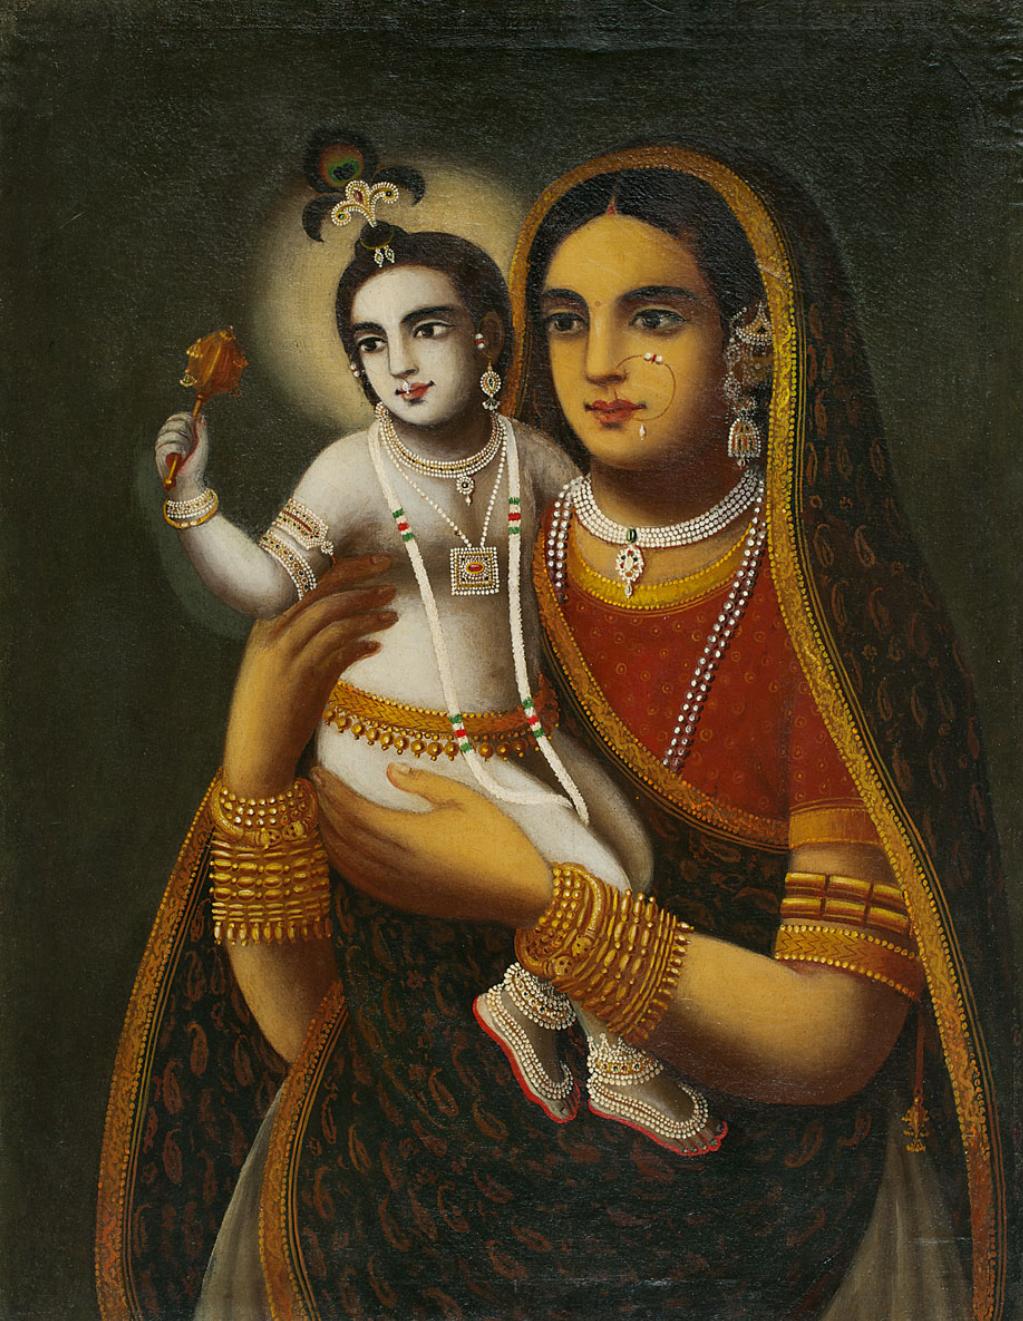 Ghare Baire Bengal Art Kolkata oil painting